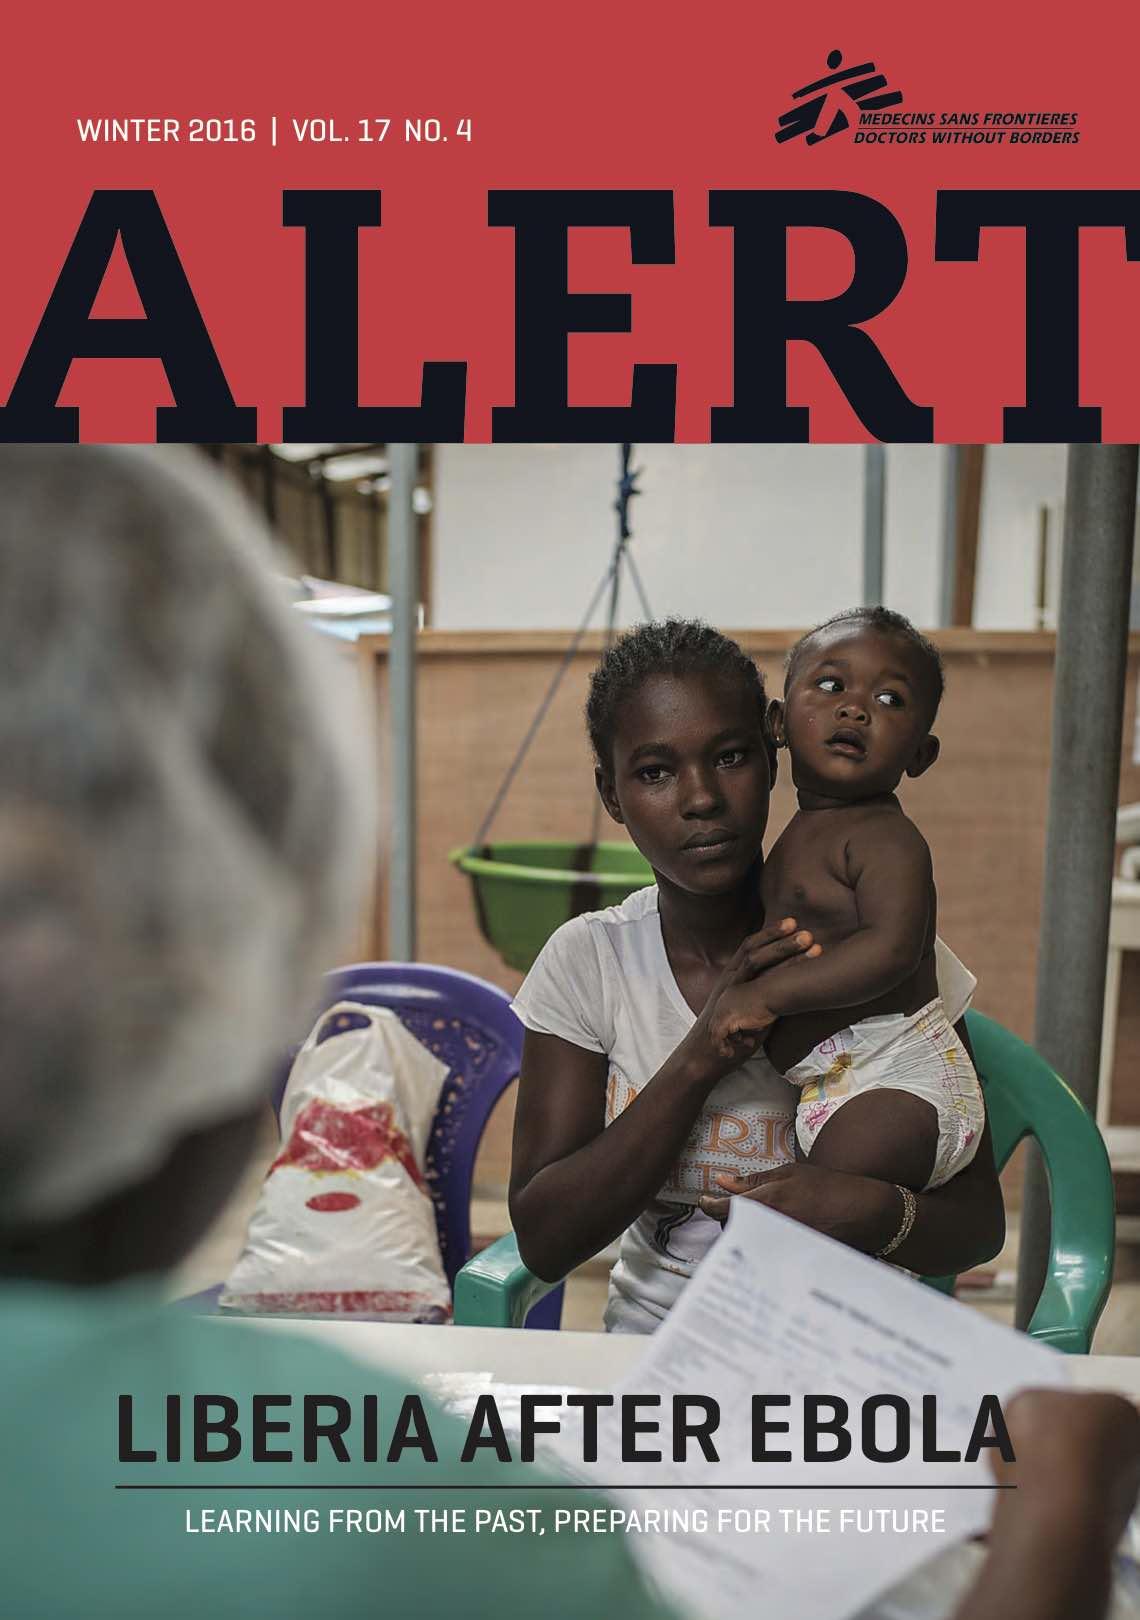 Diana Zeyneb Alhindawi_MSF_Alert_Life after Ebola_Liberia_1.jpg